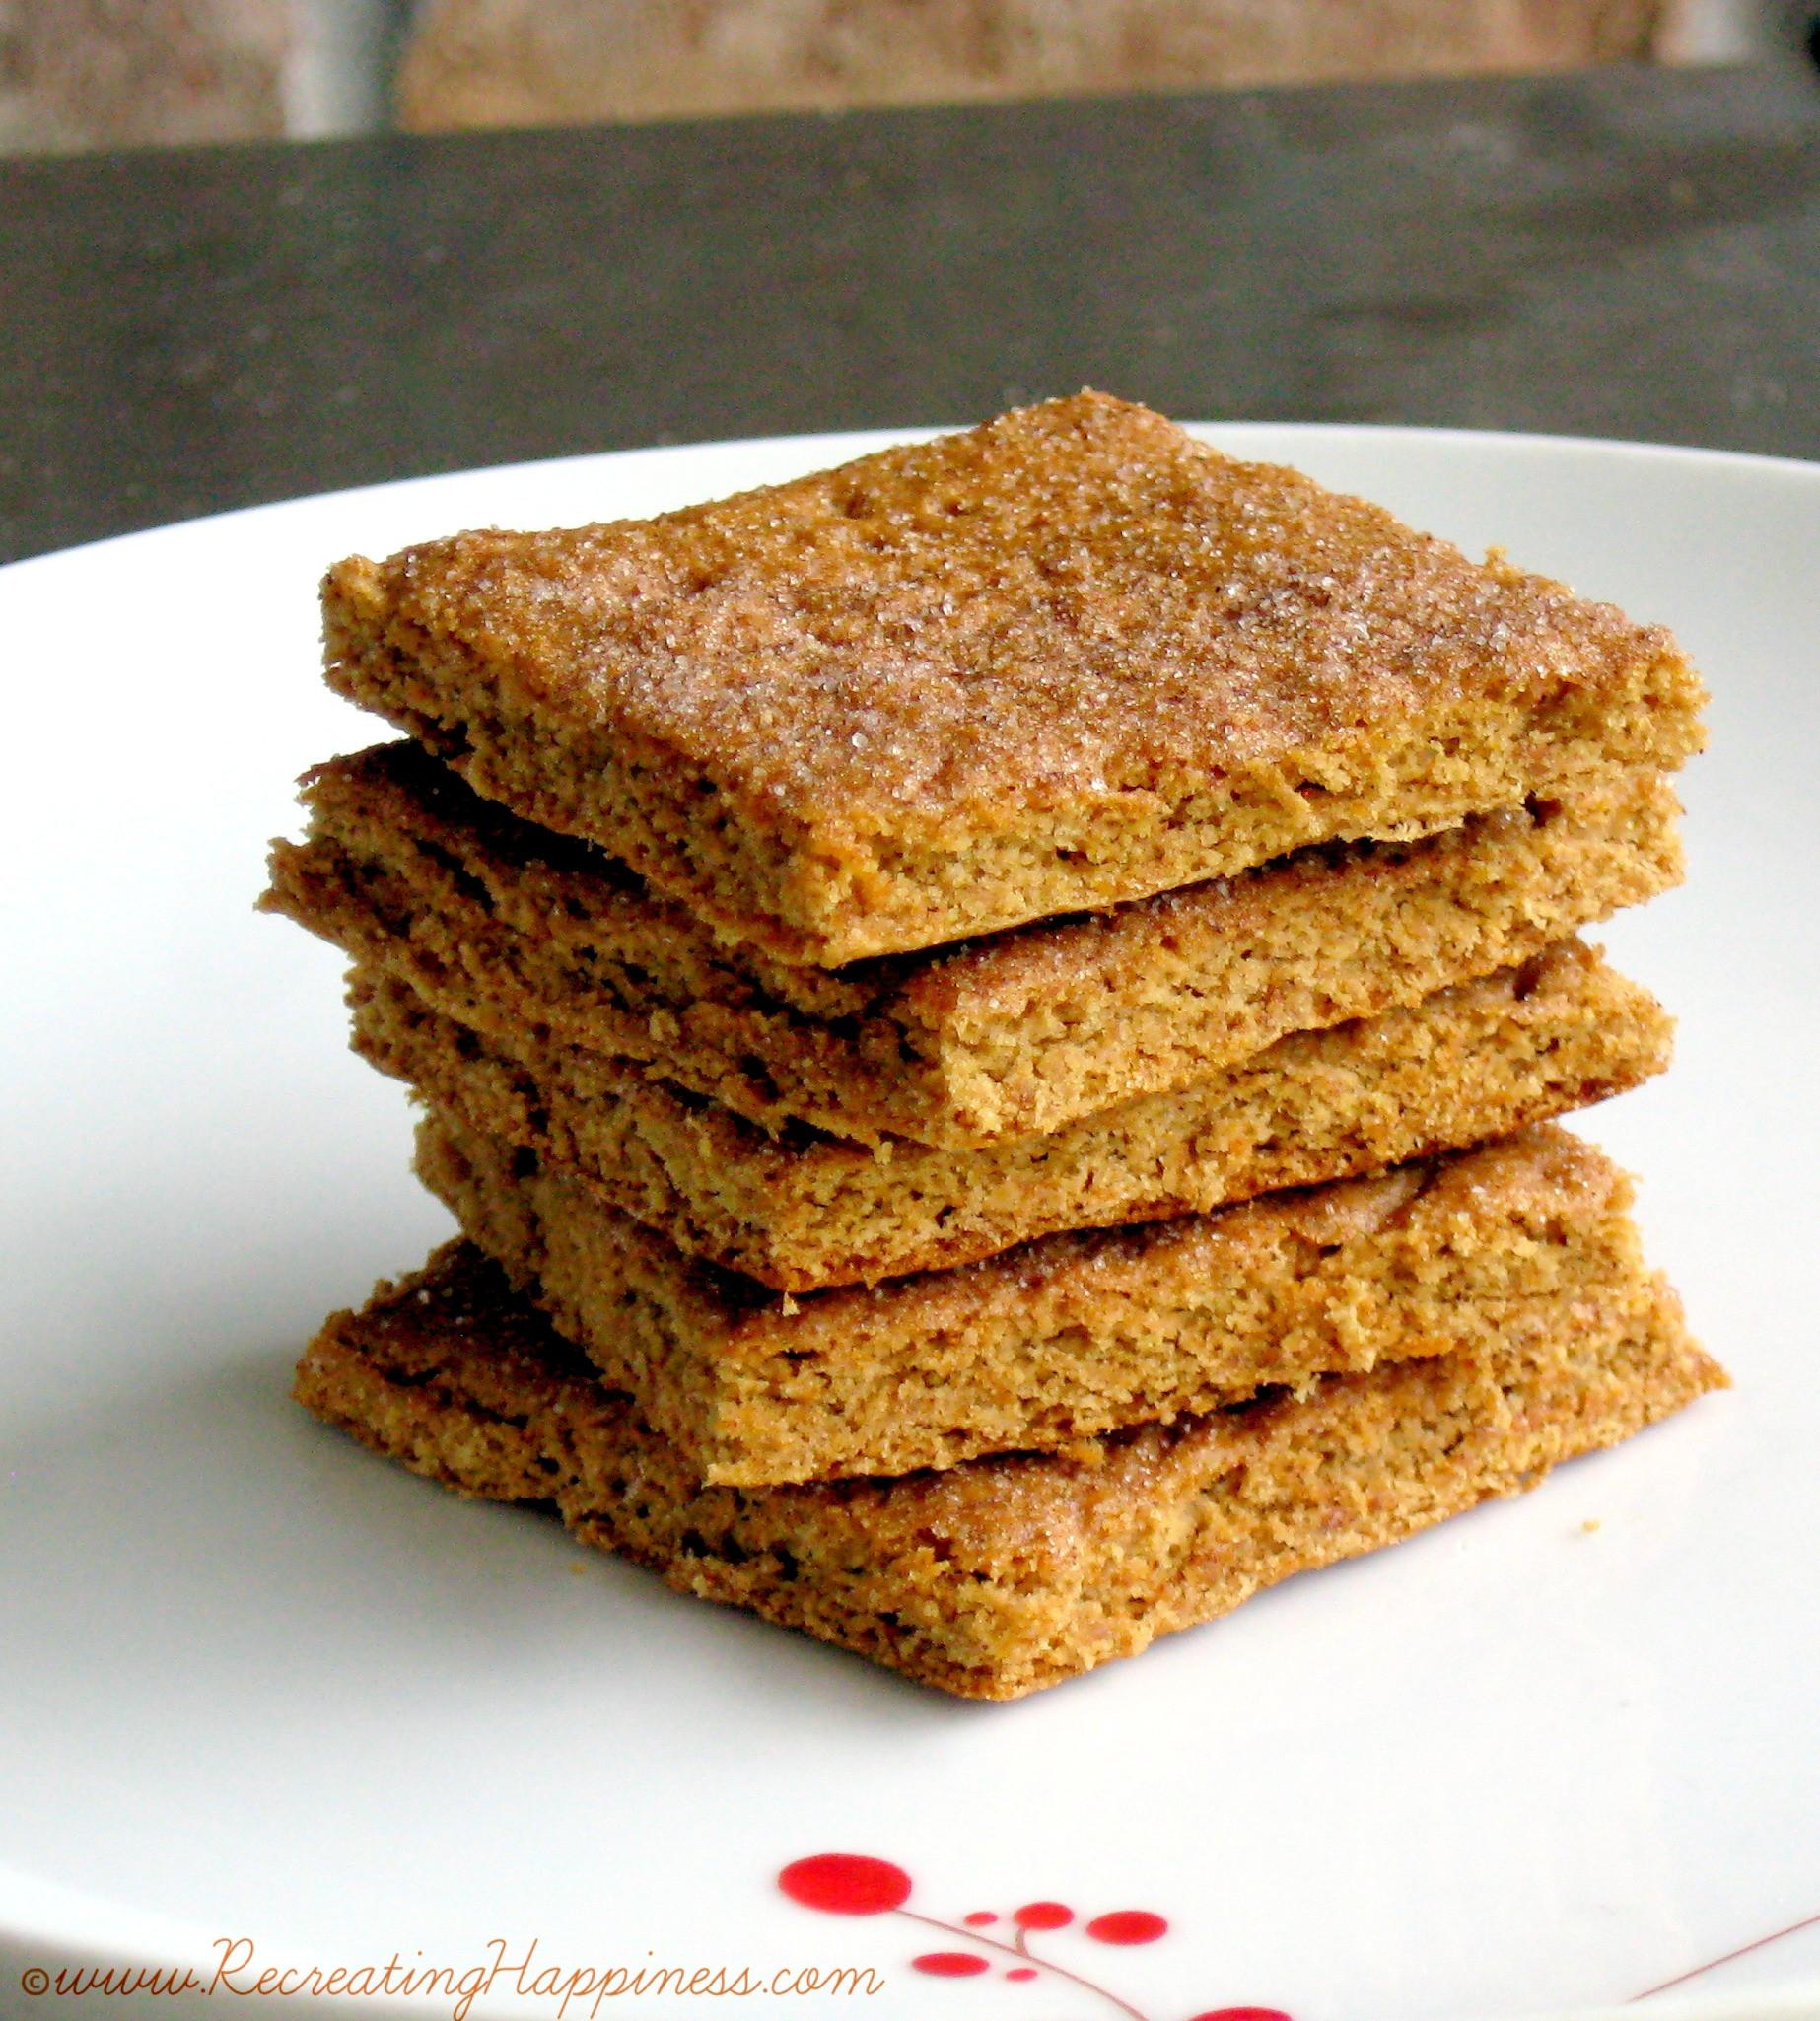 Graham Cracker Snacks Healthy  Revisited & Revised Gluten Free Graham Crackers Recipe